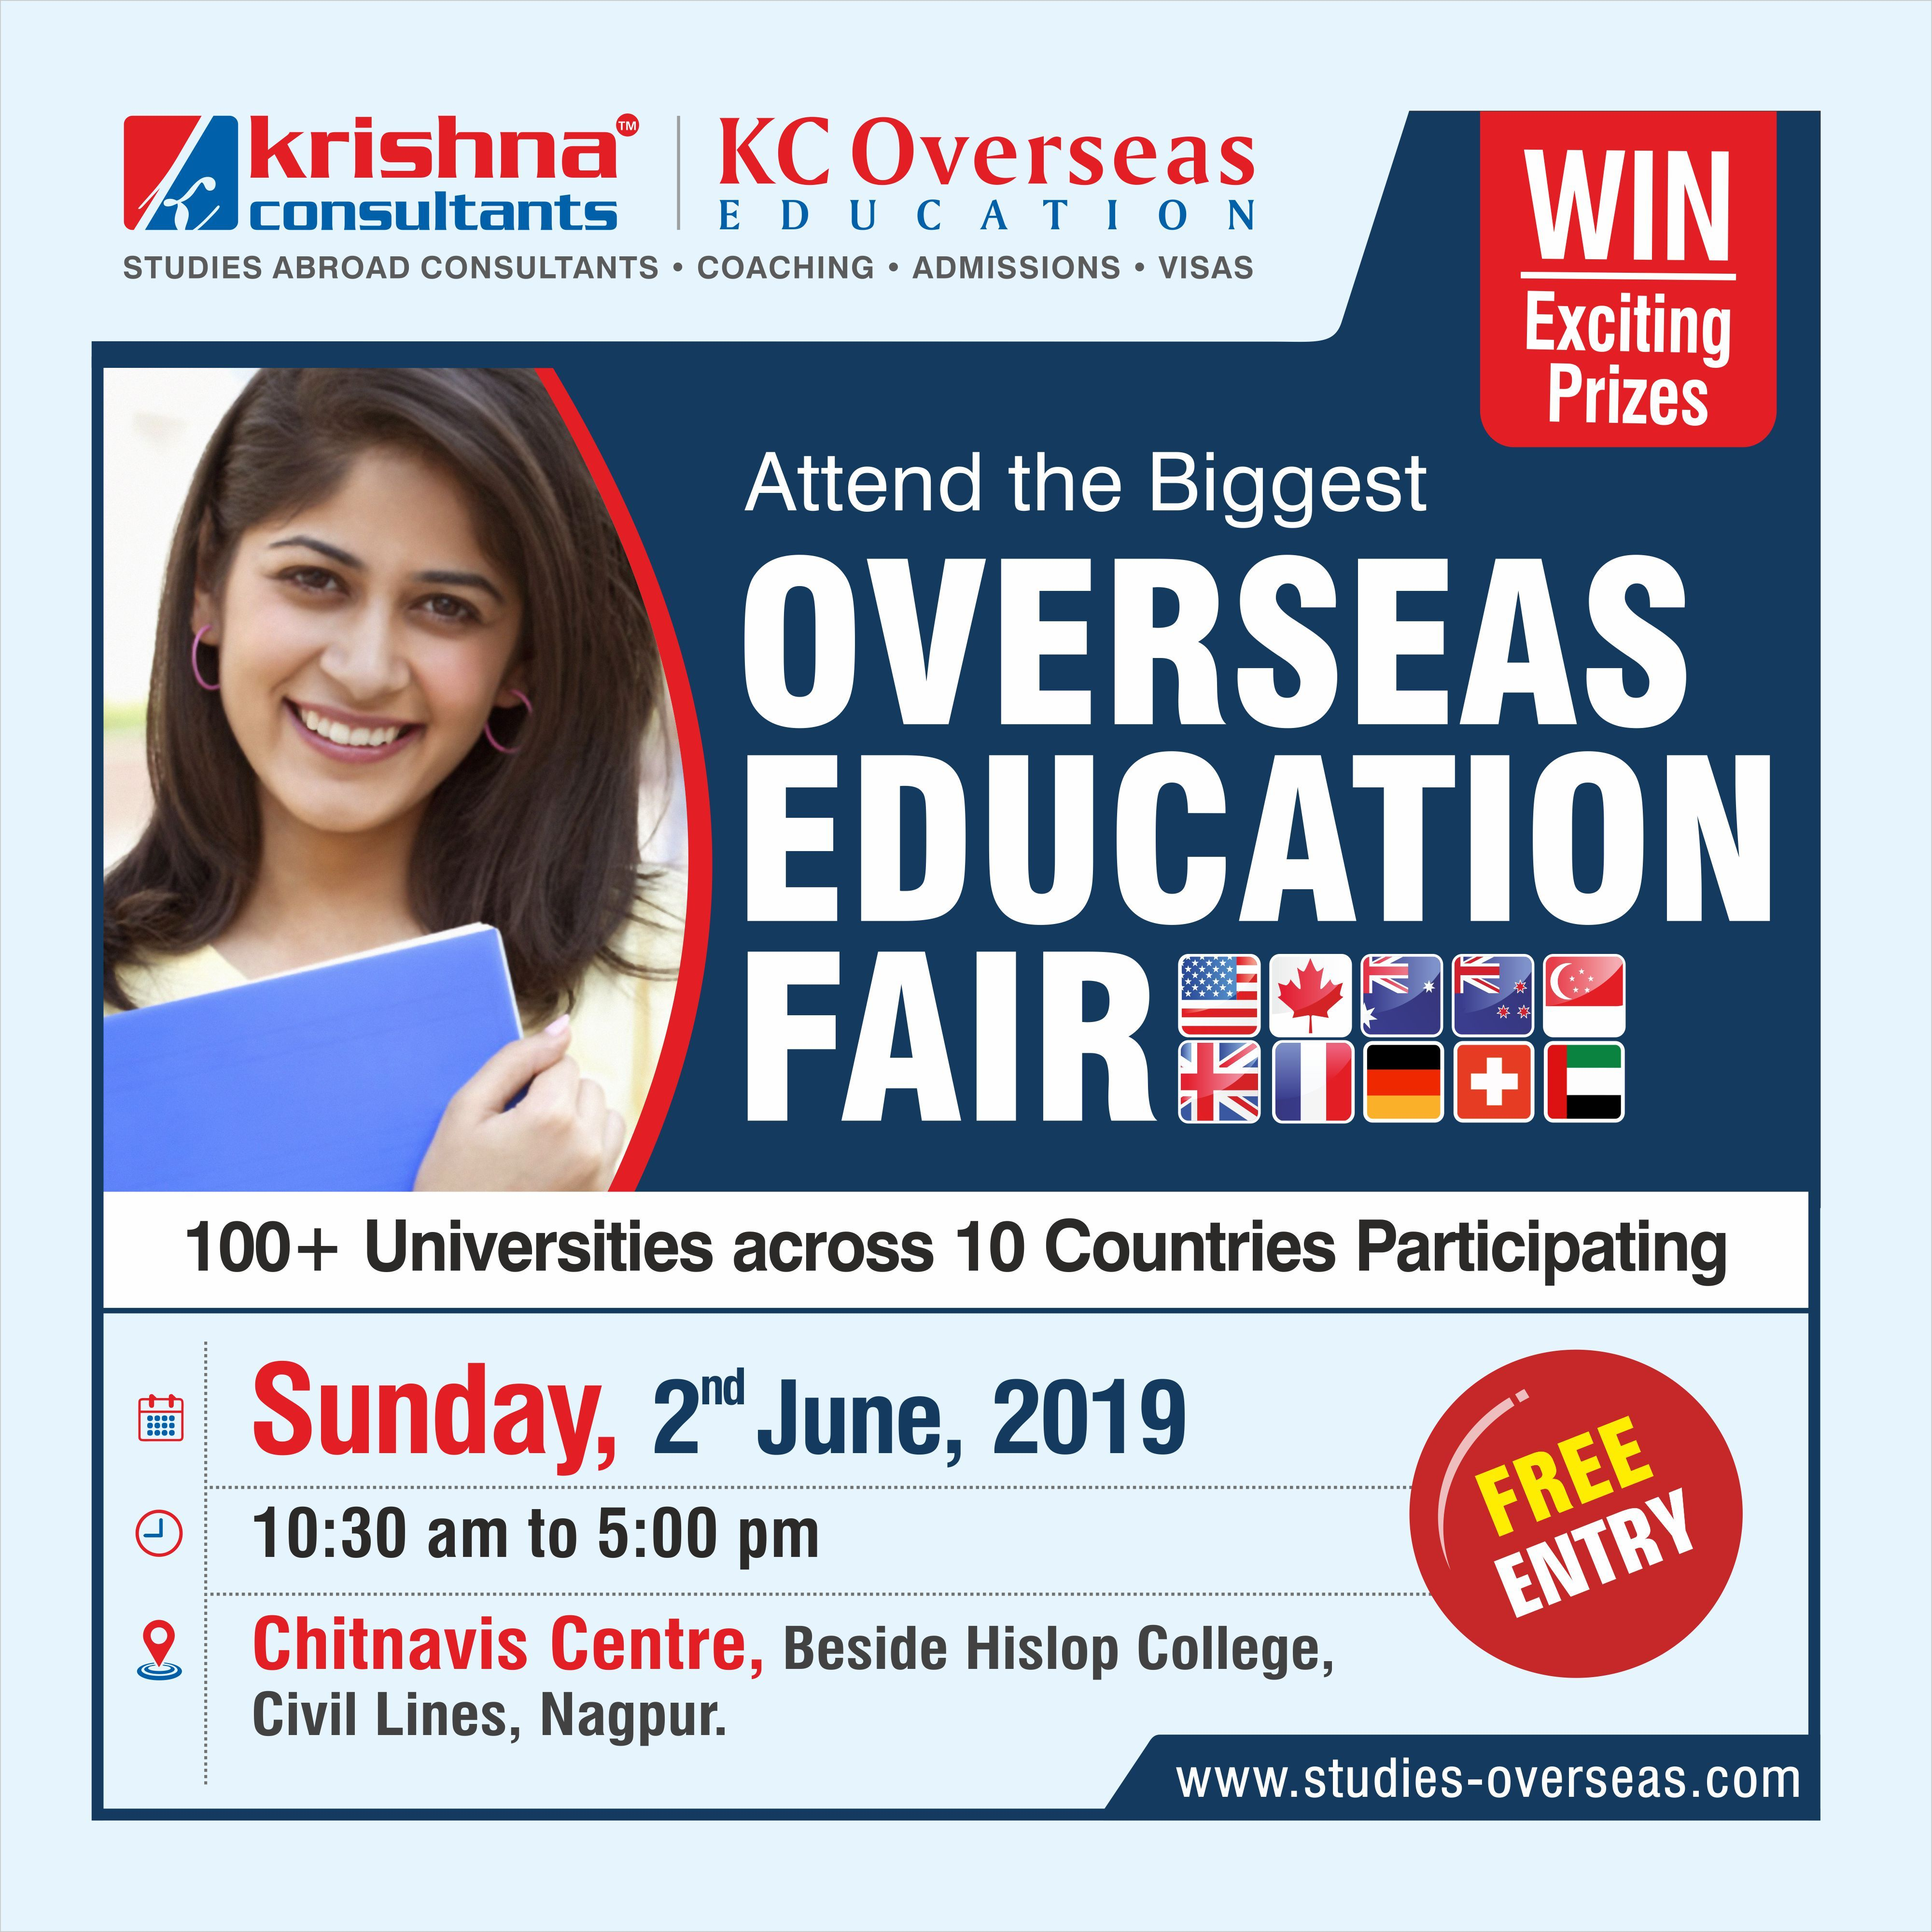 Participate in the biggest overseas education fair